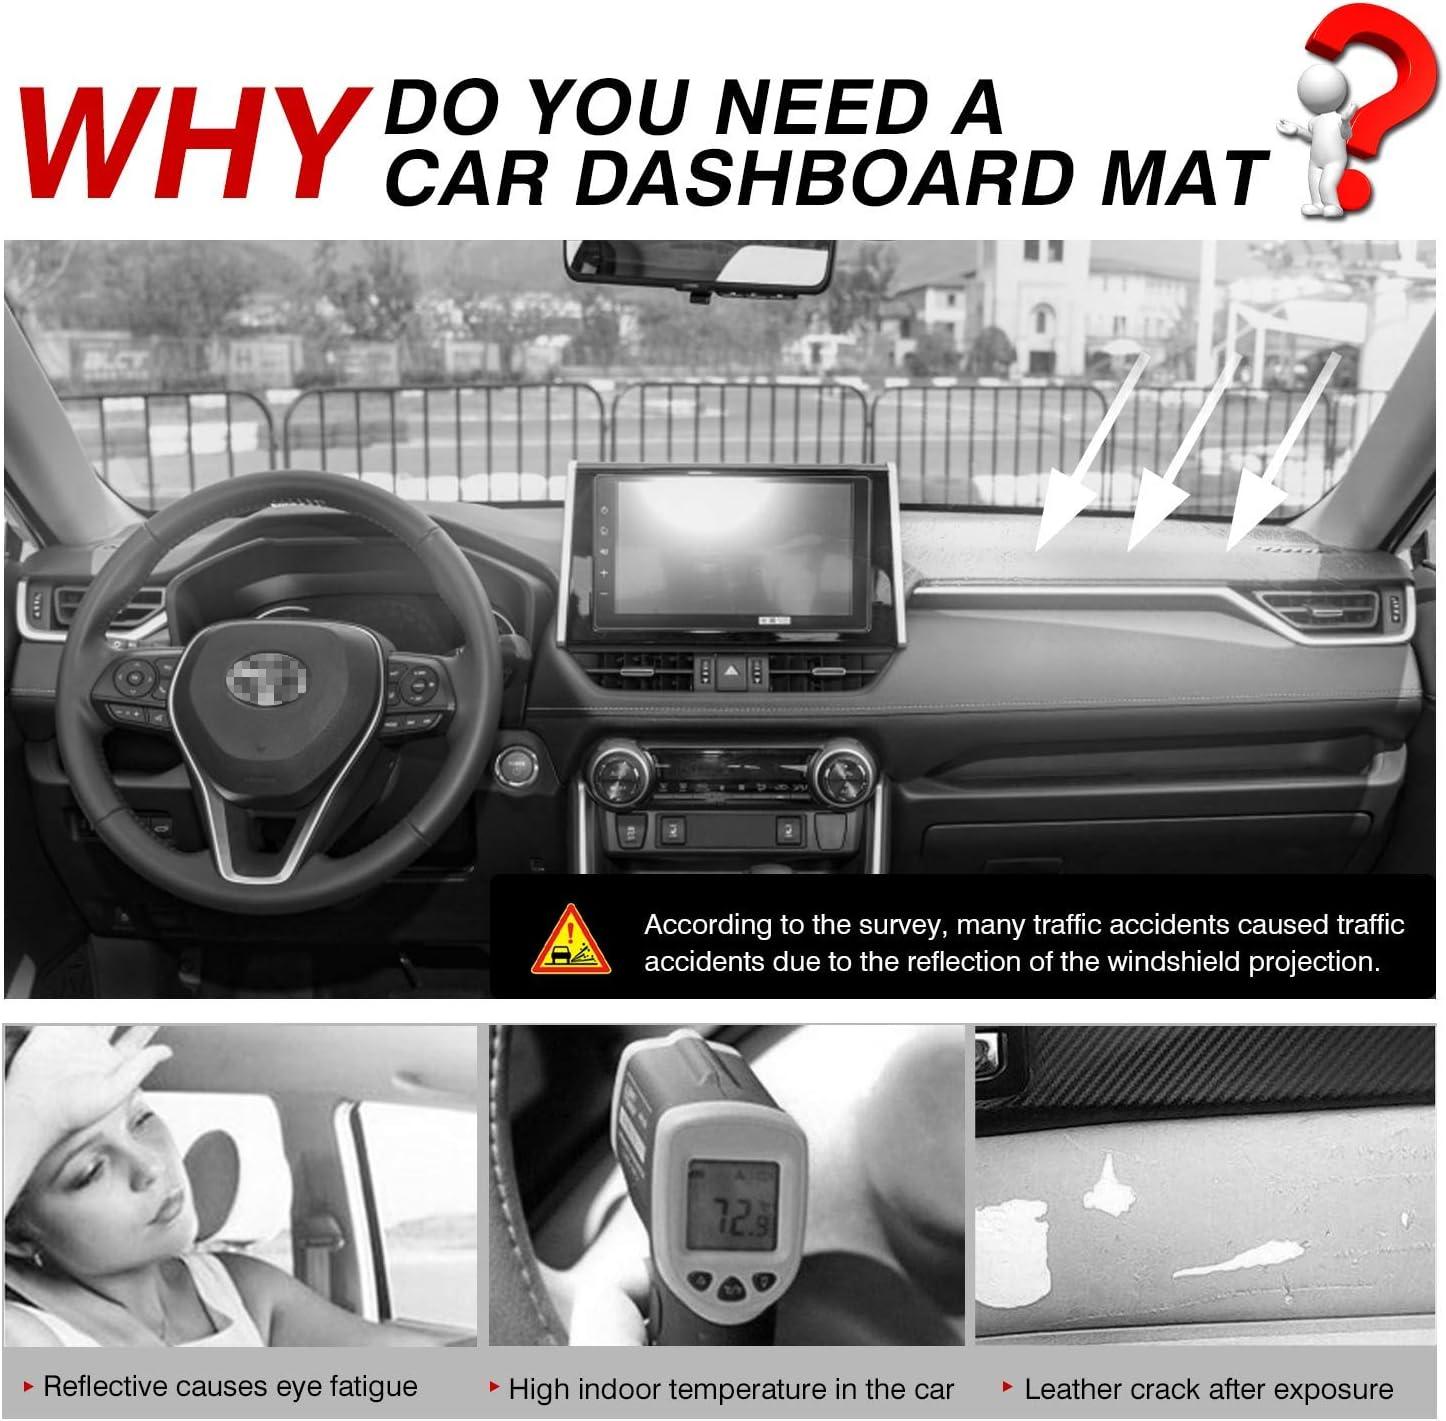 Cartist RAV4 Dashboard Mat Cover Dash Cover Nonslip Dashboard Mat Protector Sunshade No Glare for Toyota RAV4 2019 2020